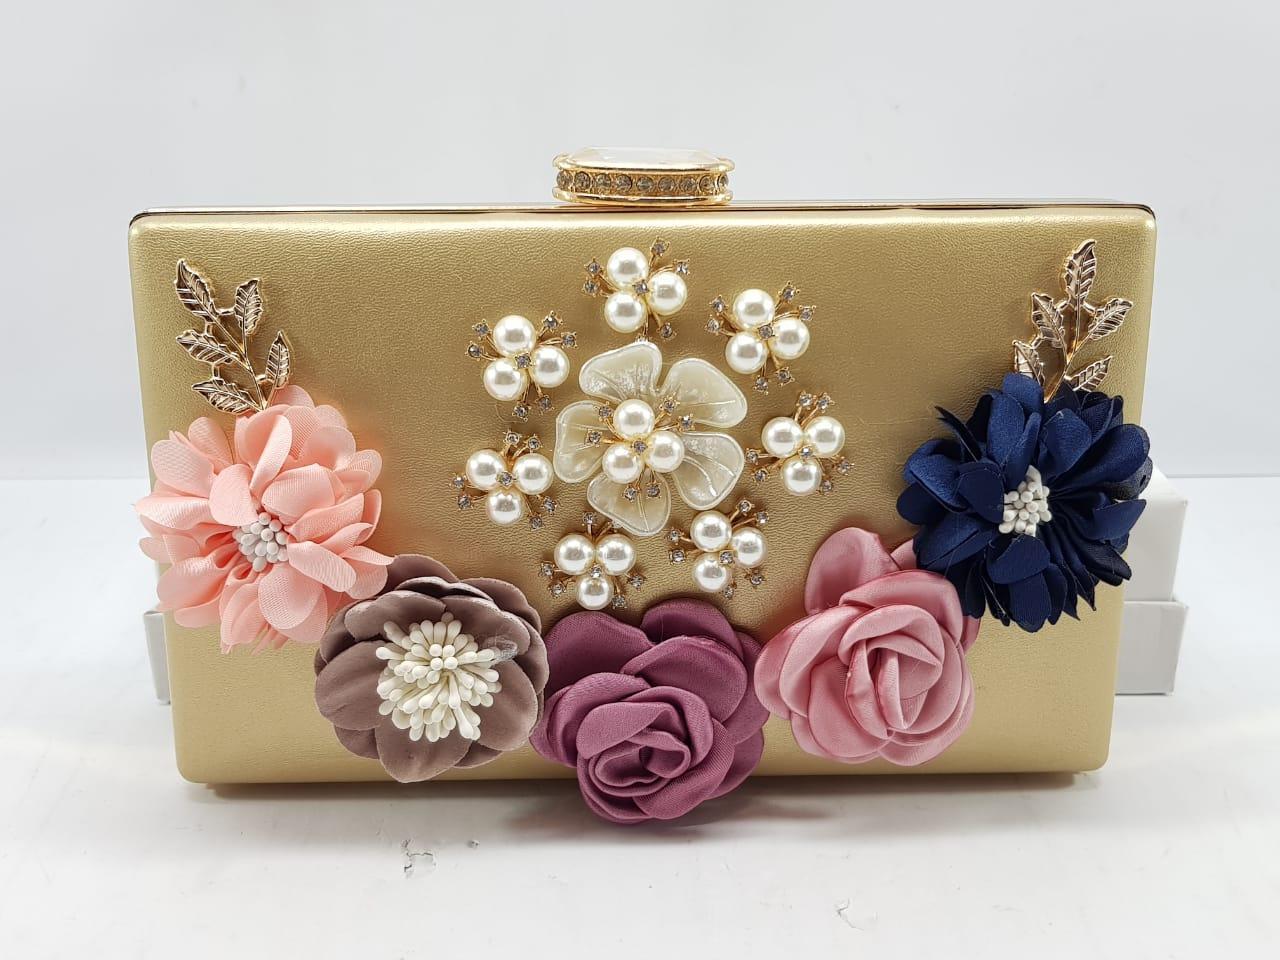 Luxury Bridal Bag Banquet Party Evening Bag - Clutches Ladies Wedding Hand  Bag - Purse 58445e50fc40e